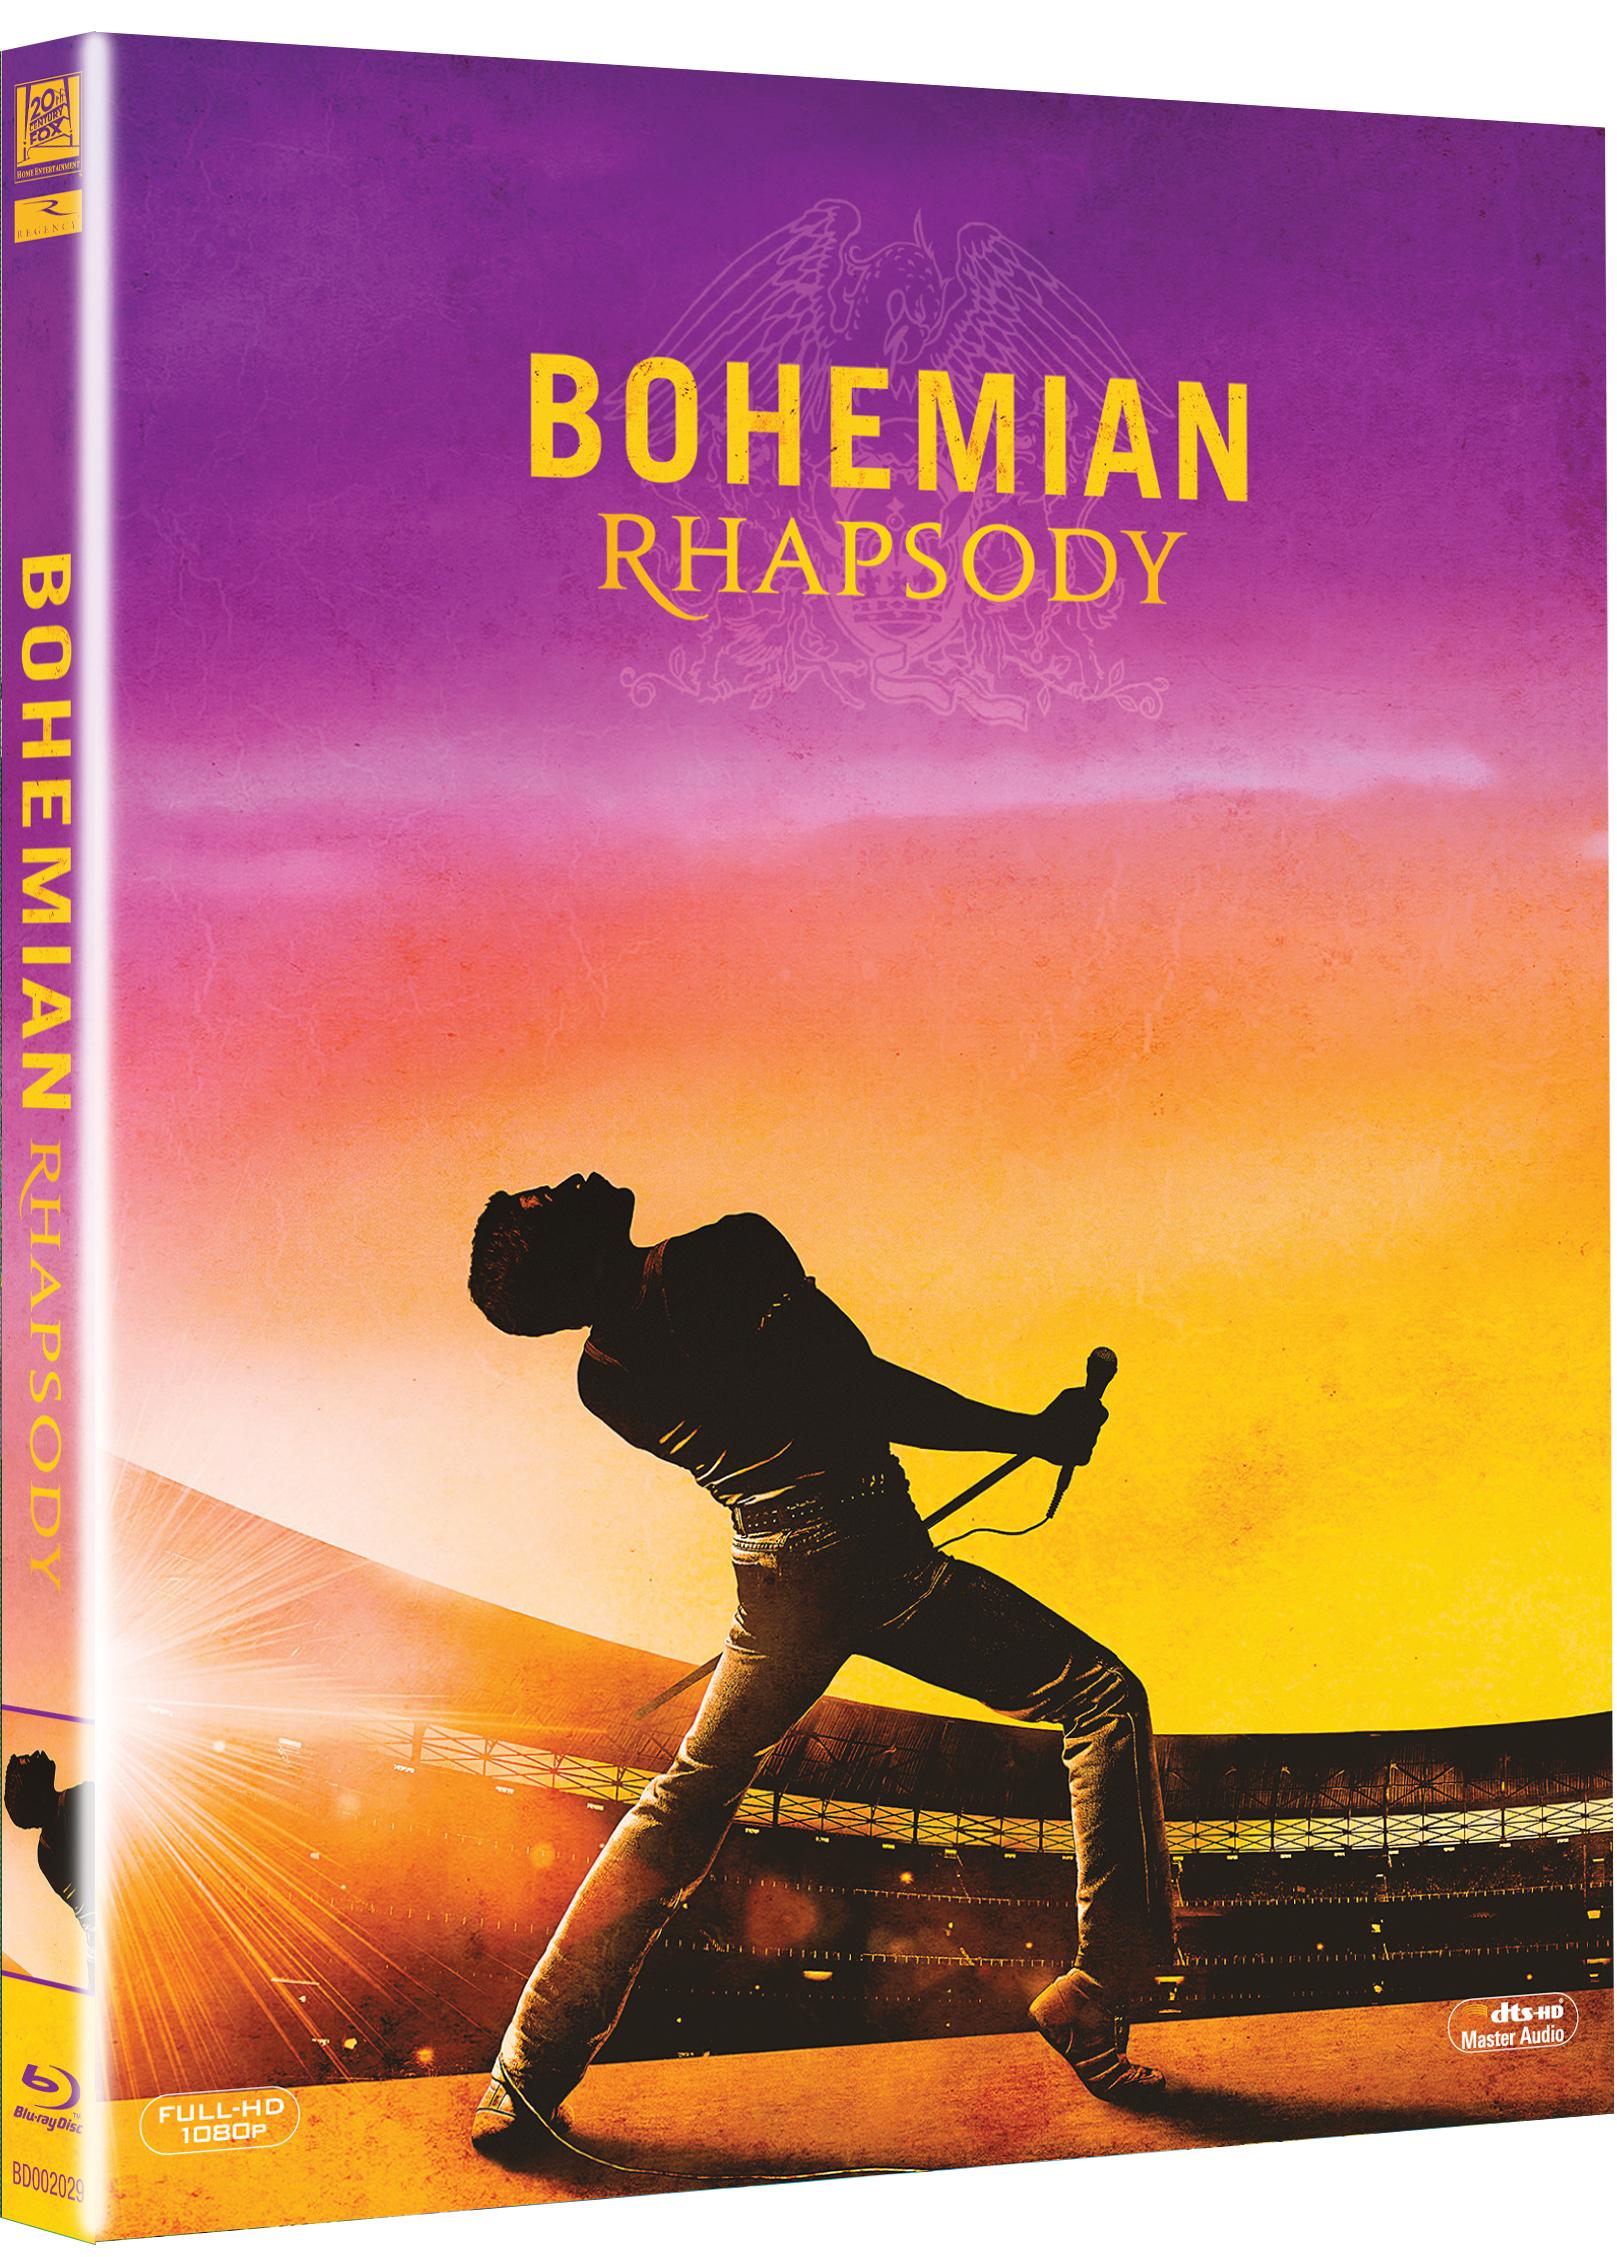 Bohemian Rhapsody - Blu-ray Bohemian Rhapsody